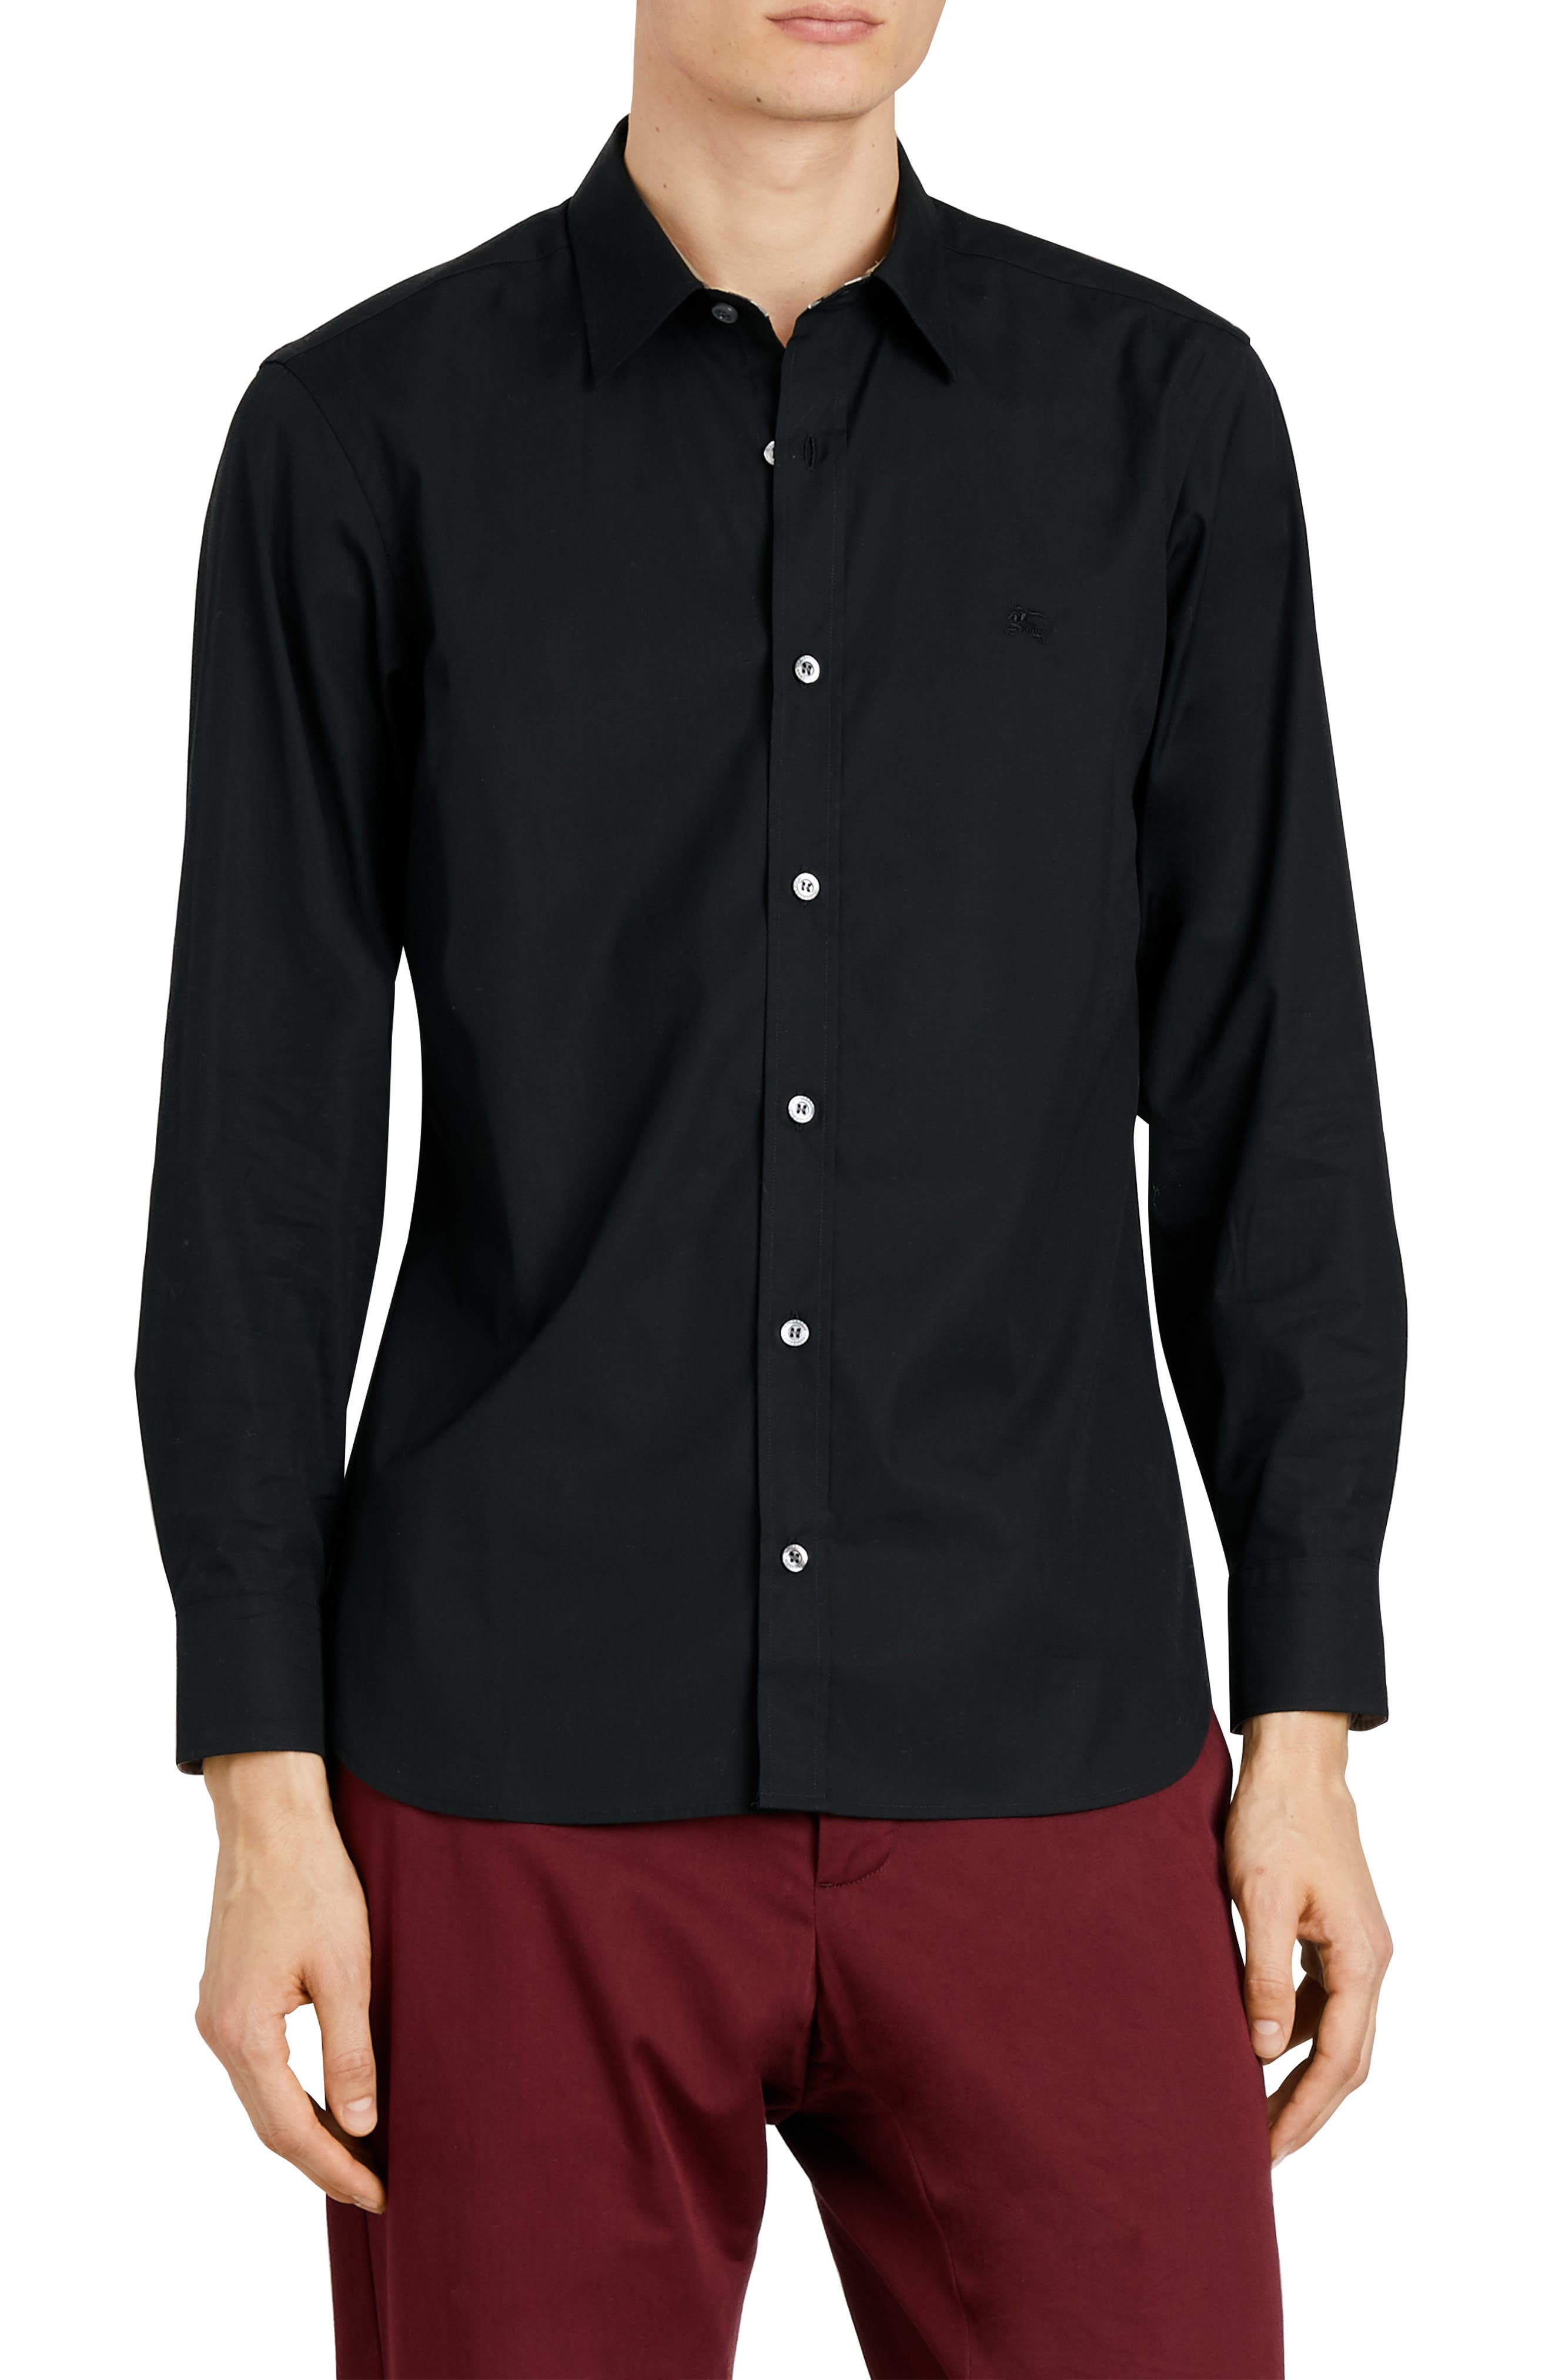 BURBERRY, William Stretch Poplin Sport Shirt, Main thumbnail 1, color, BLACK